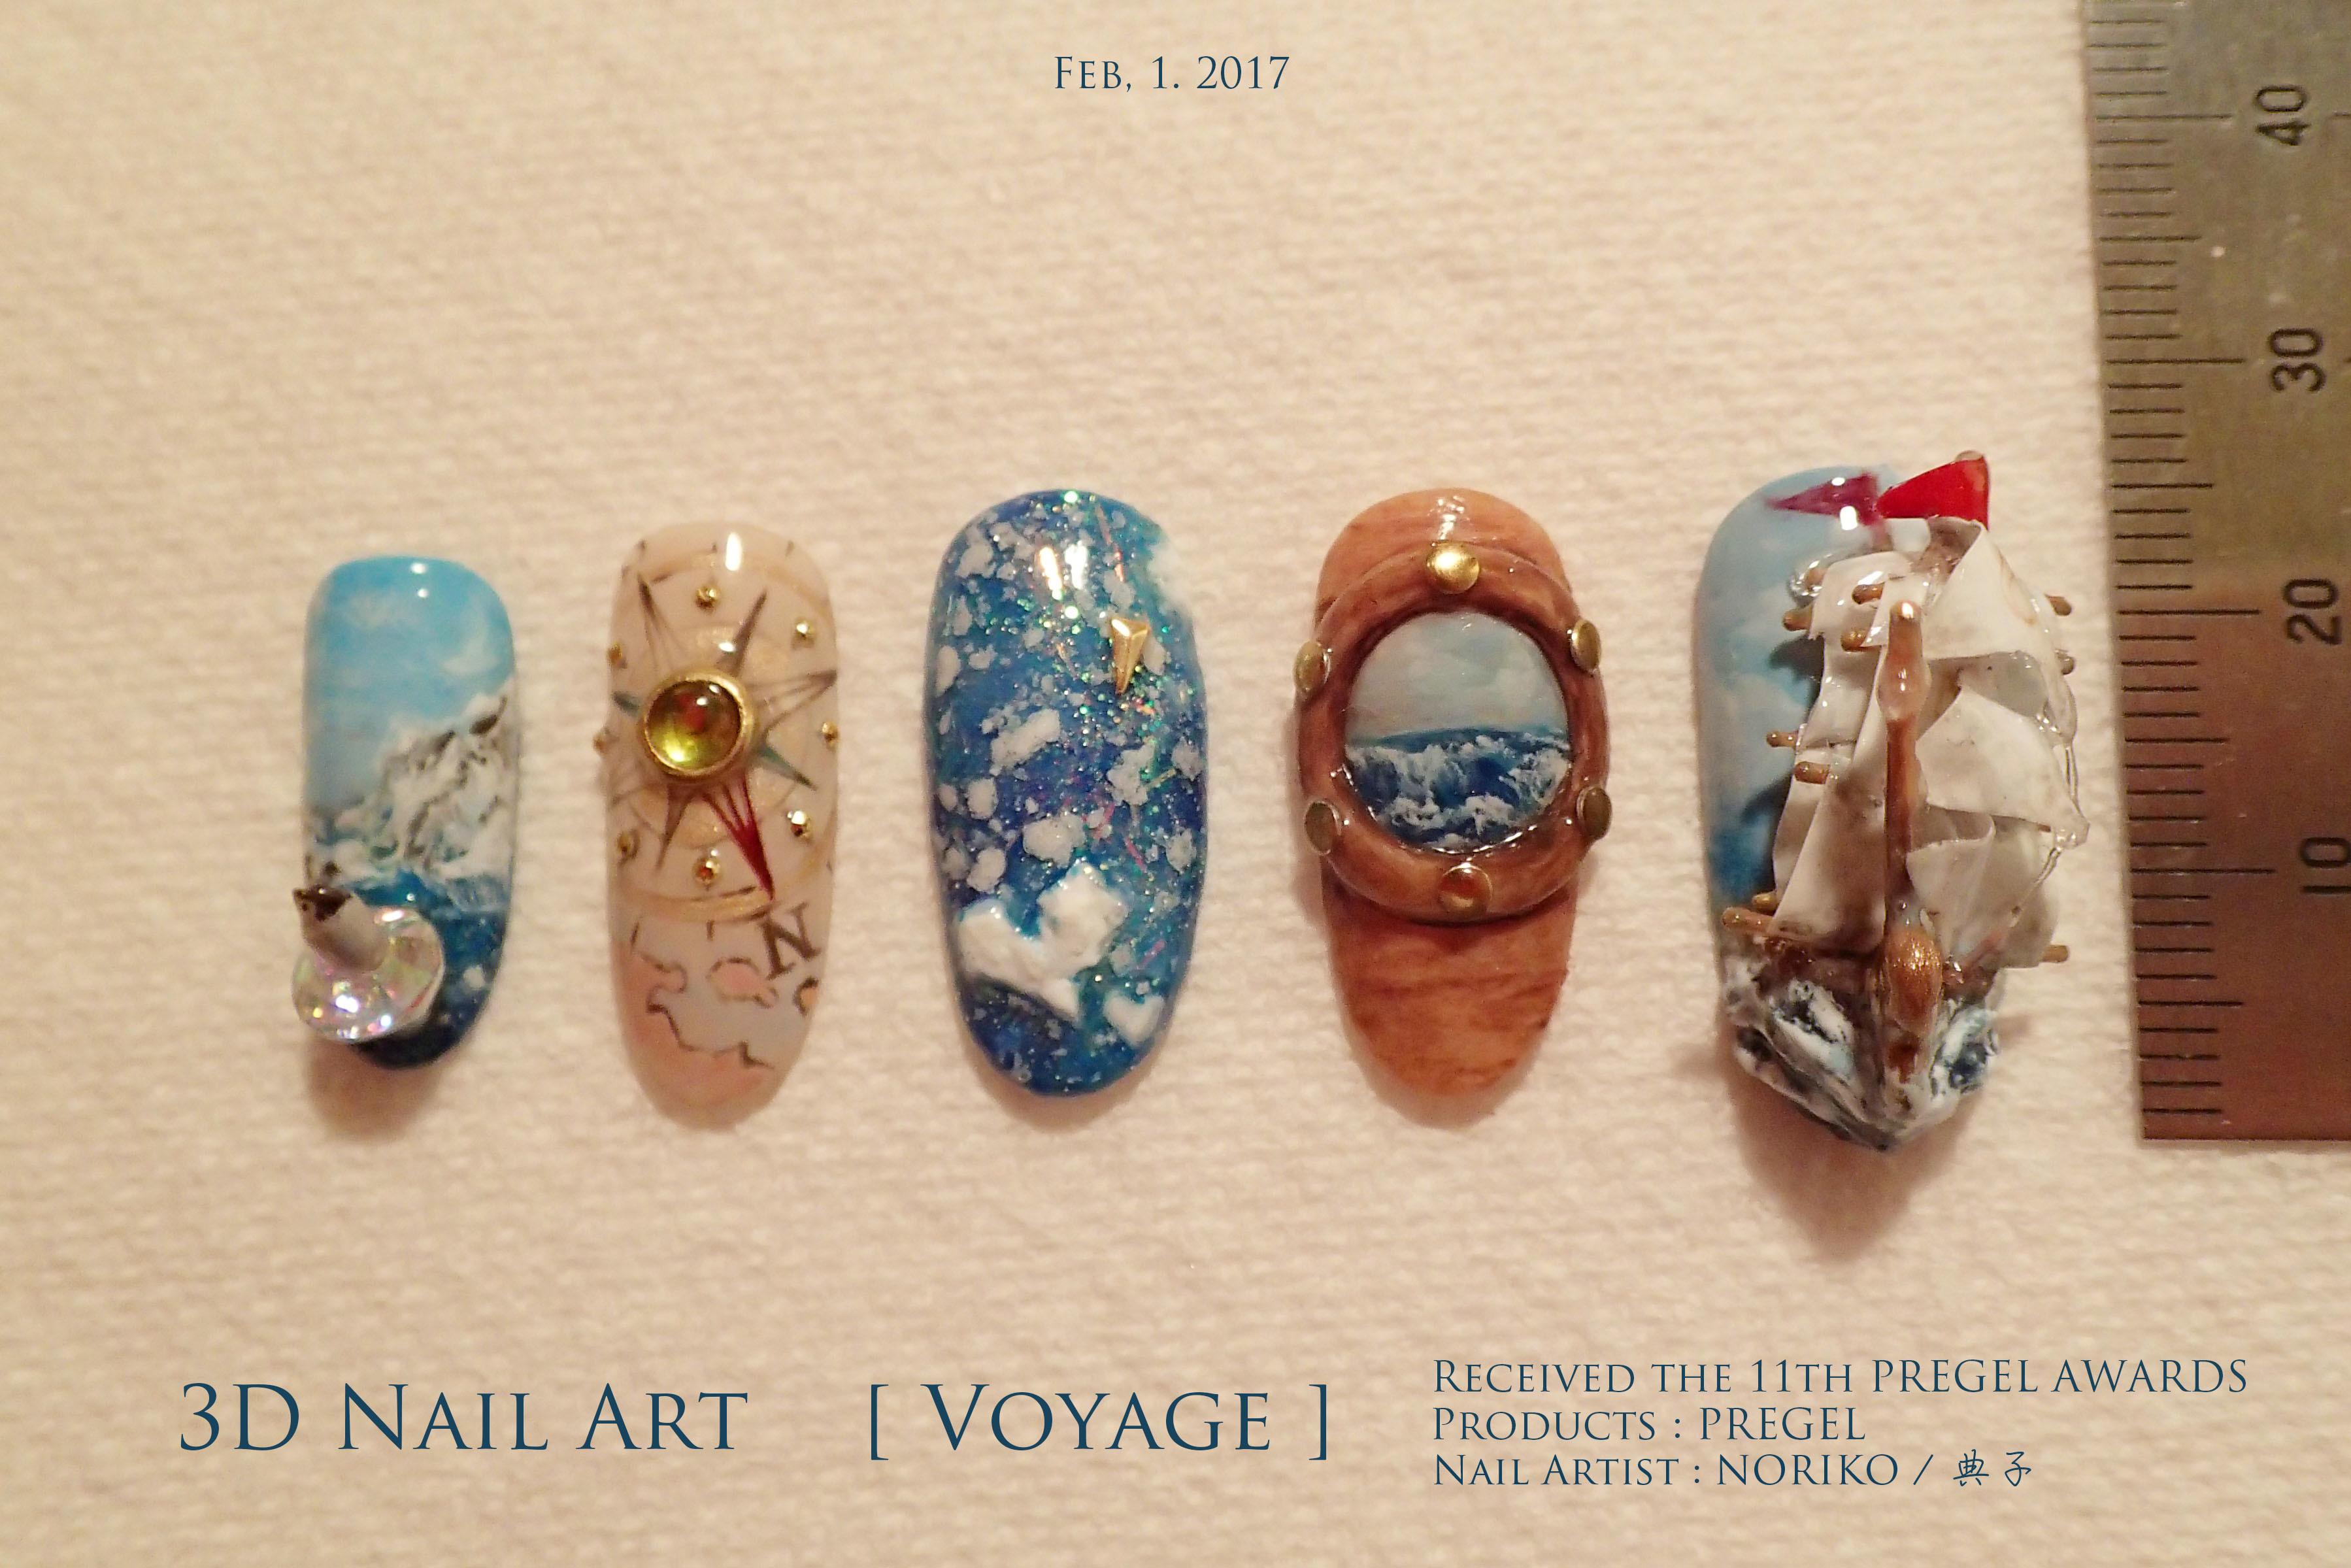 Pregel Award_29 第11回プリジェルアワード受賞アート Nail Artist : NORIKO/ 典子